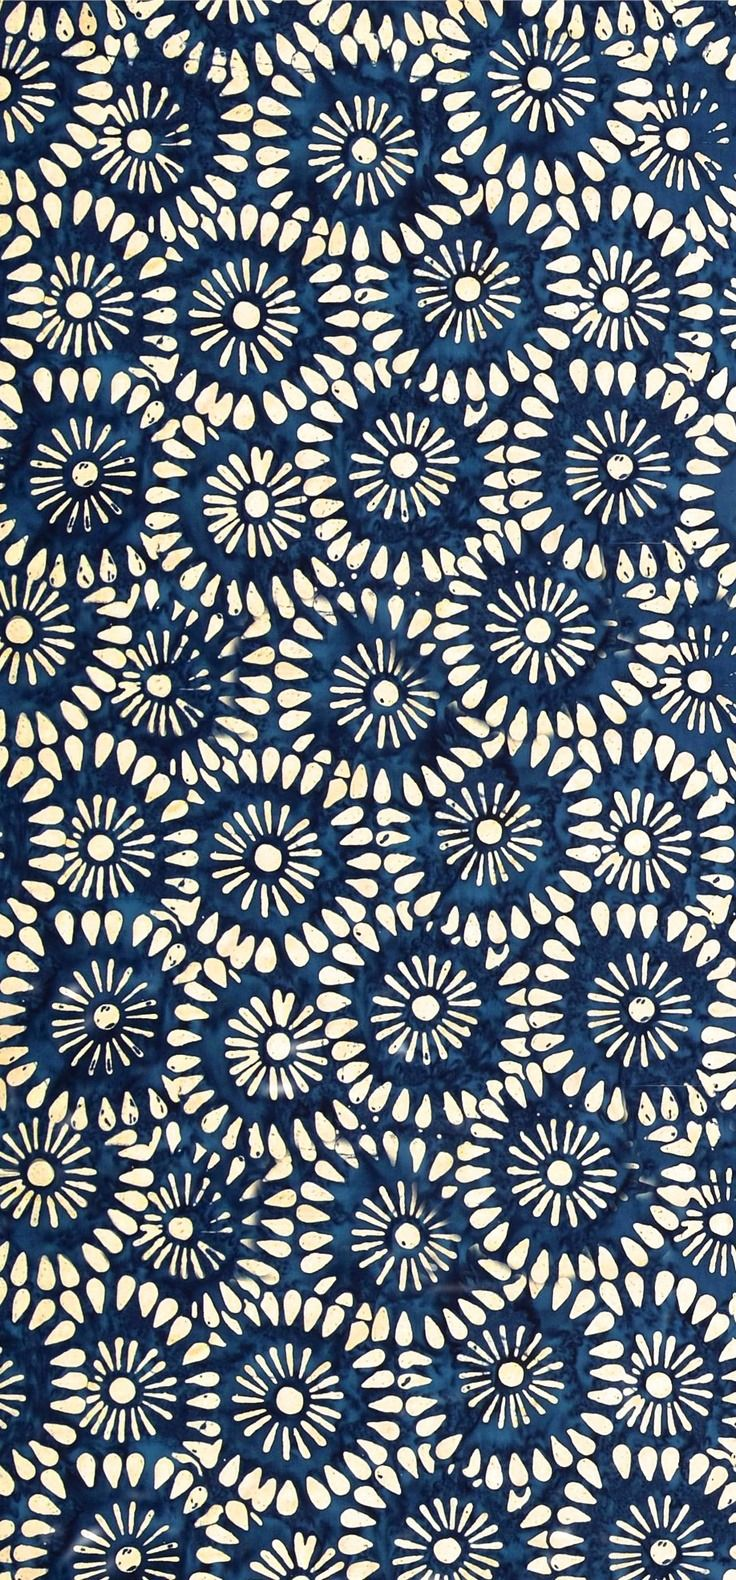 batik (?) flower pattern  |  inspirationlane.tumblr.com